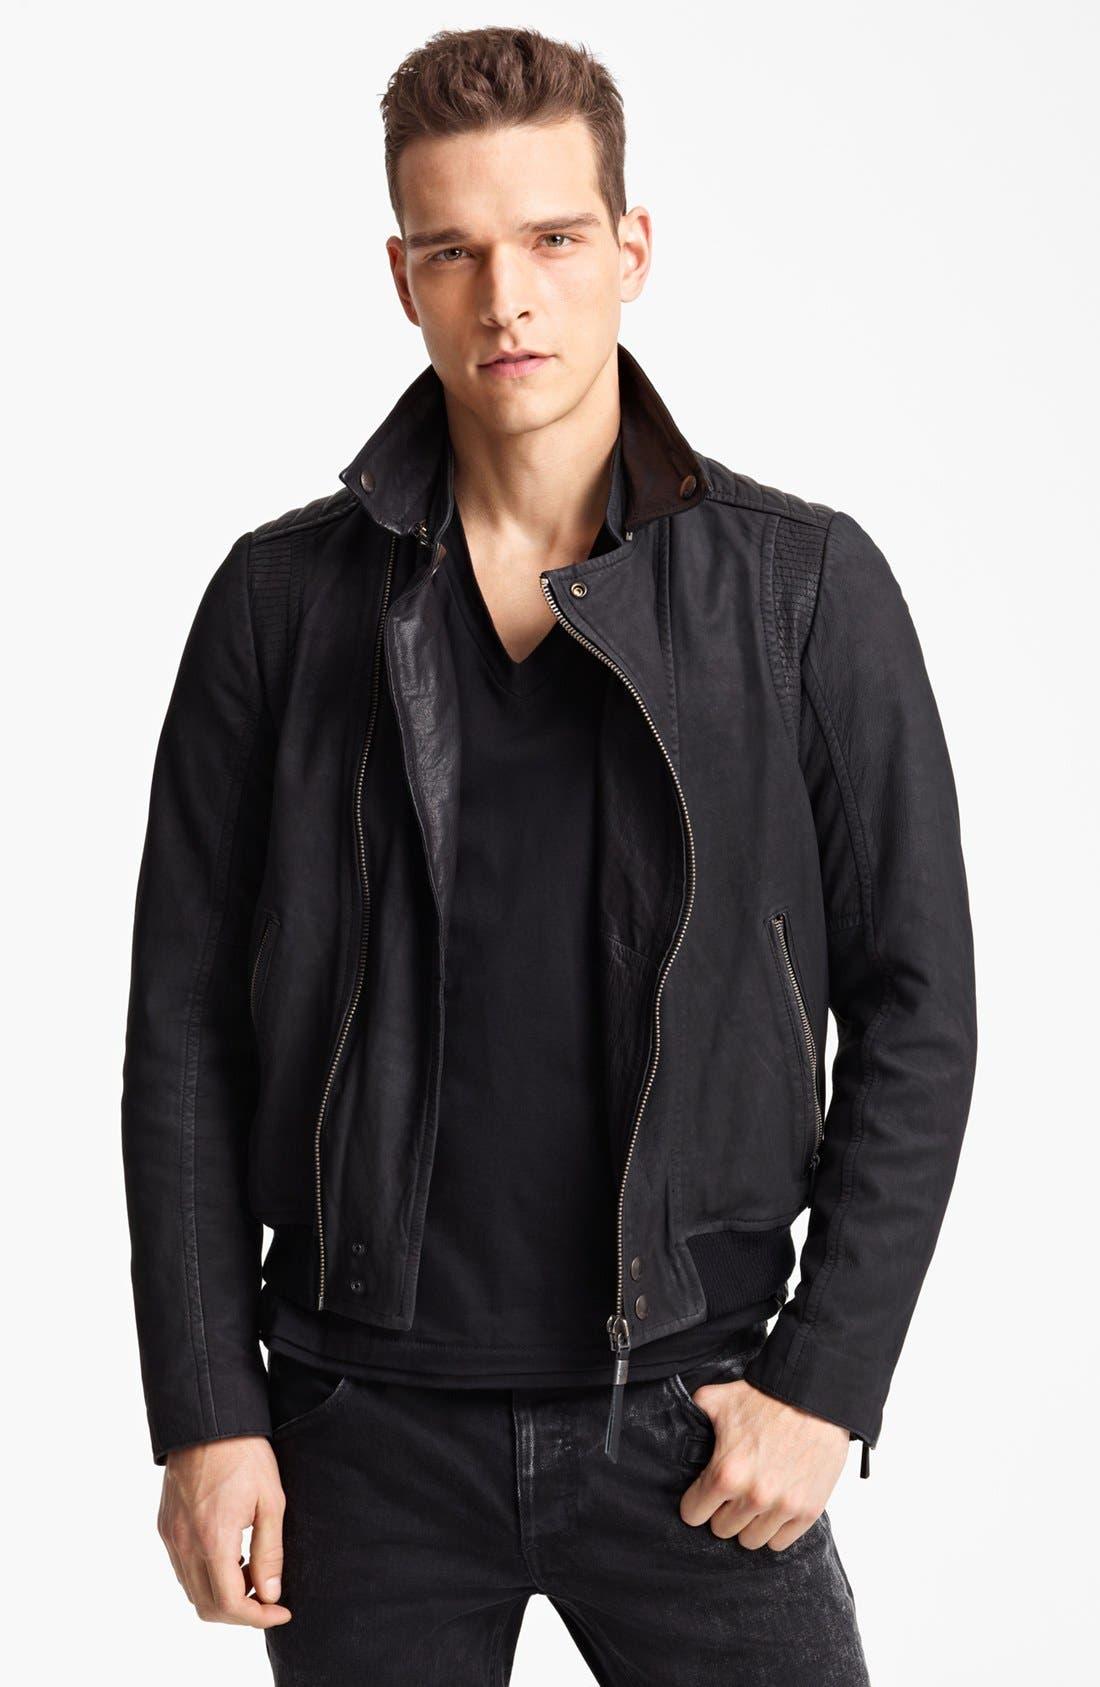 JUST CAVALLI, Leather Moto Jacket, Main thumbnail 1, color, 001